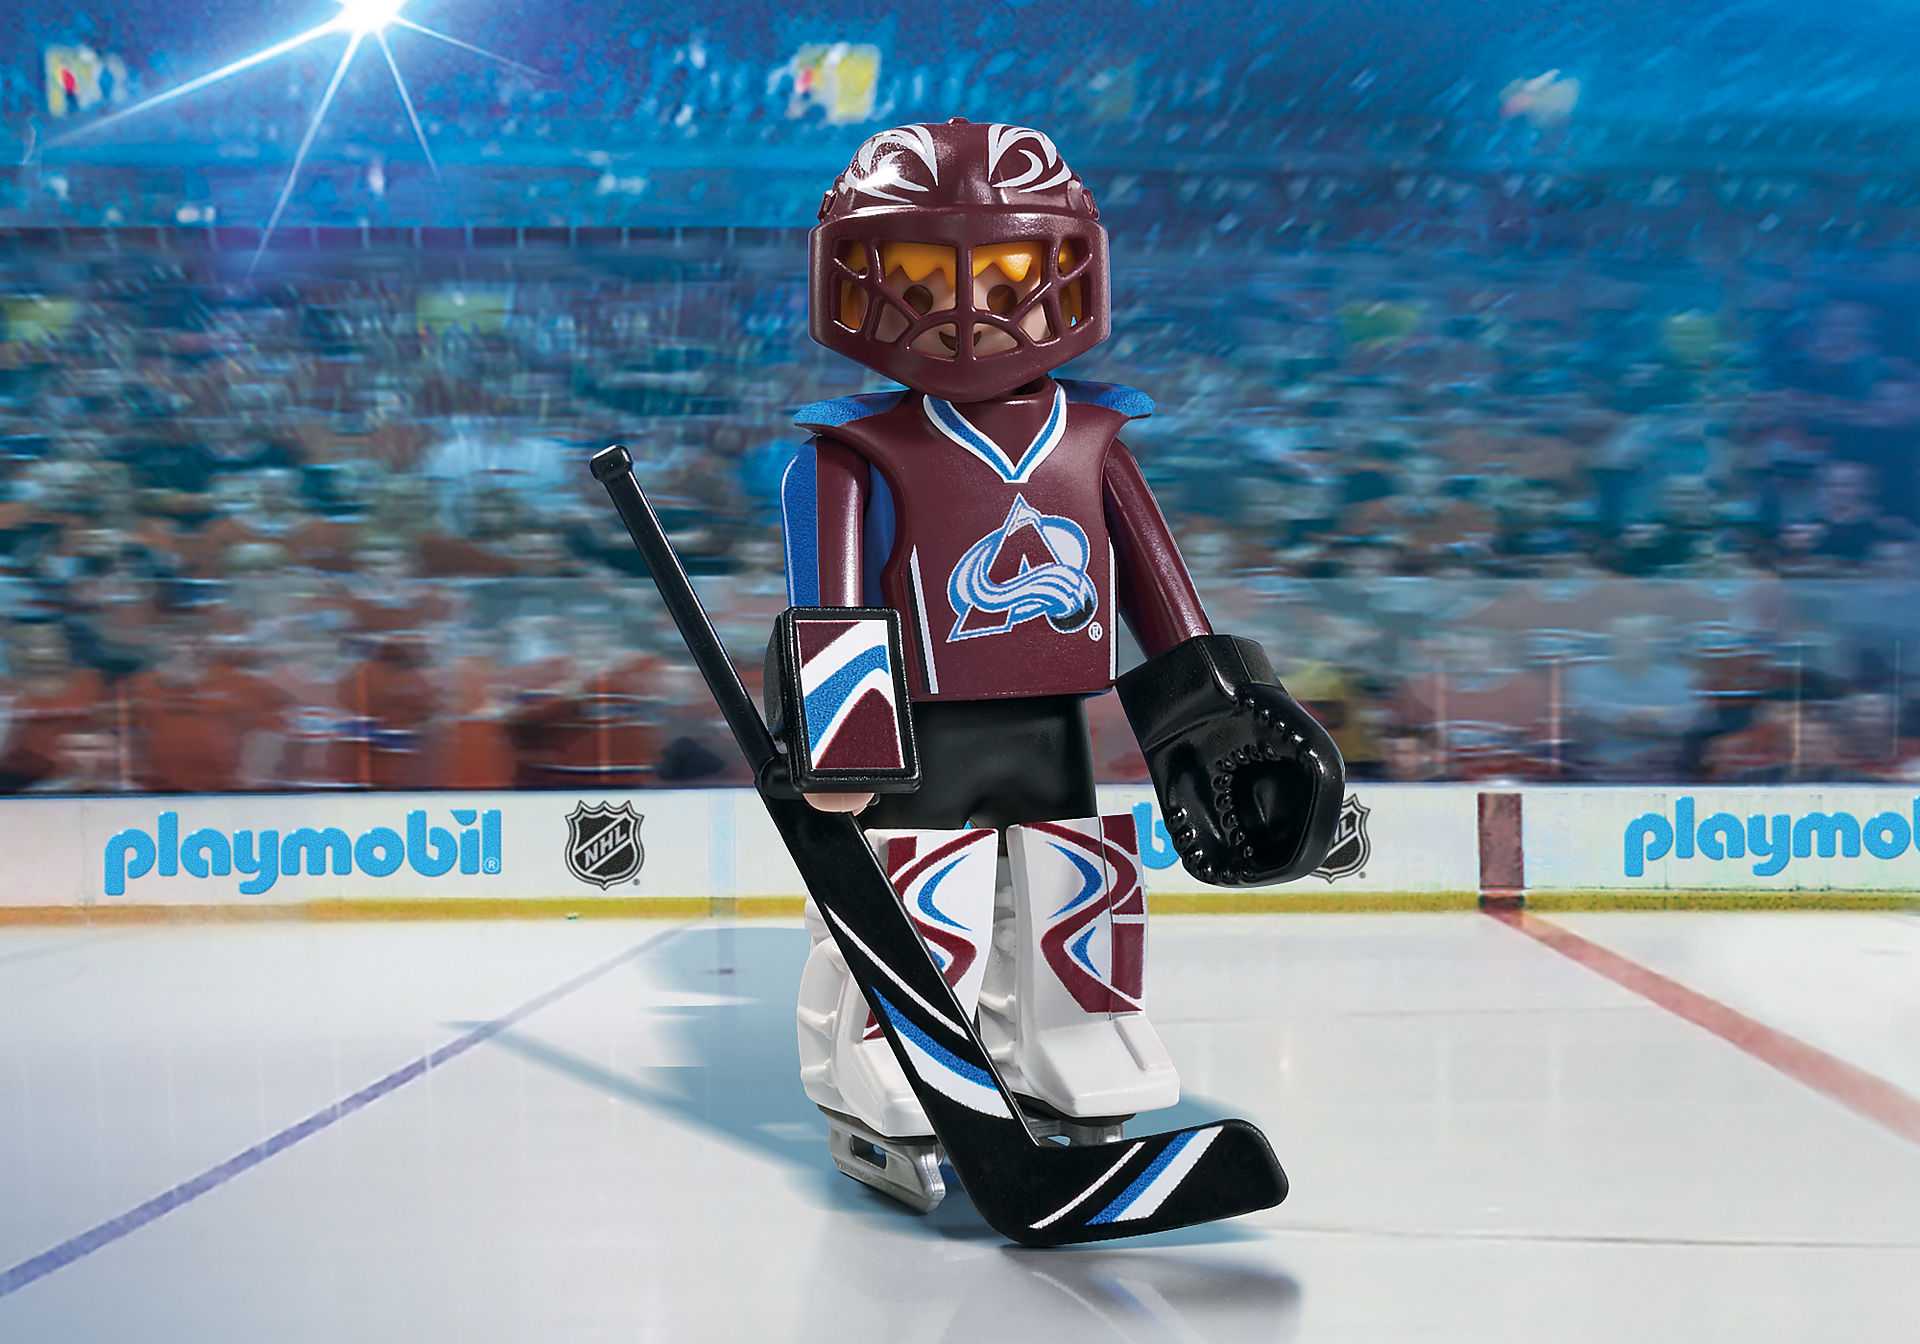 http://media.playmobil.com/i/playmobil/9189_product_detail/NHL™ Colorado Avalanche™ Goalie